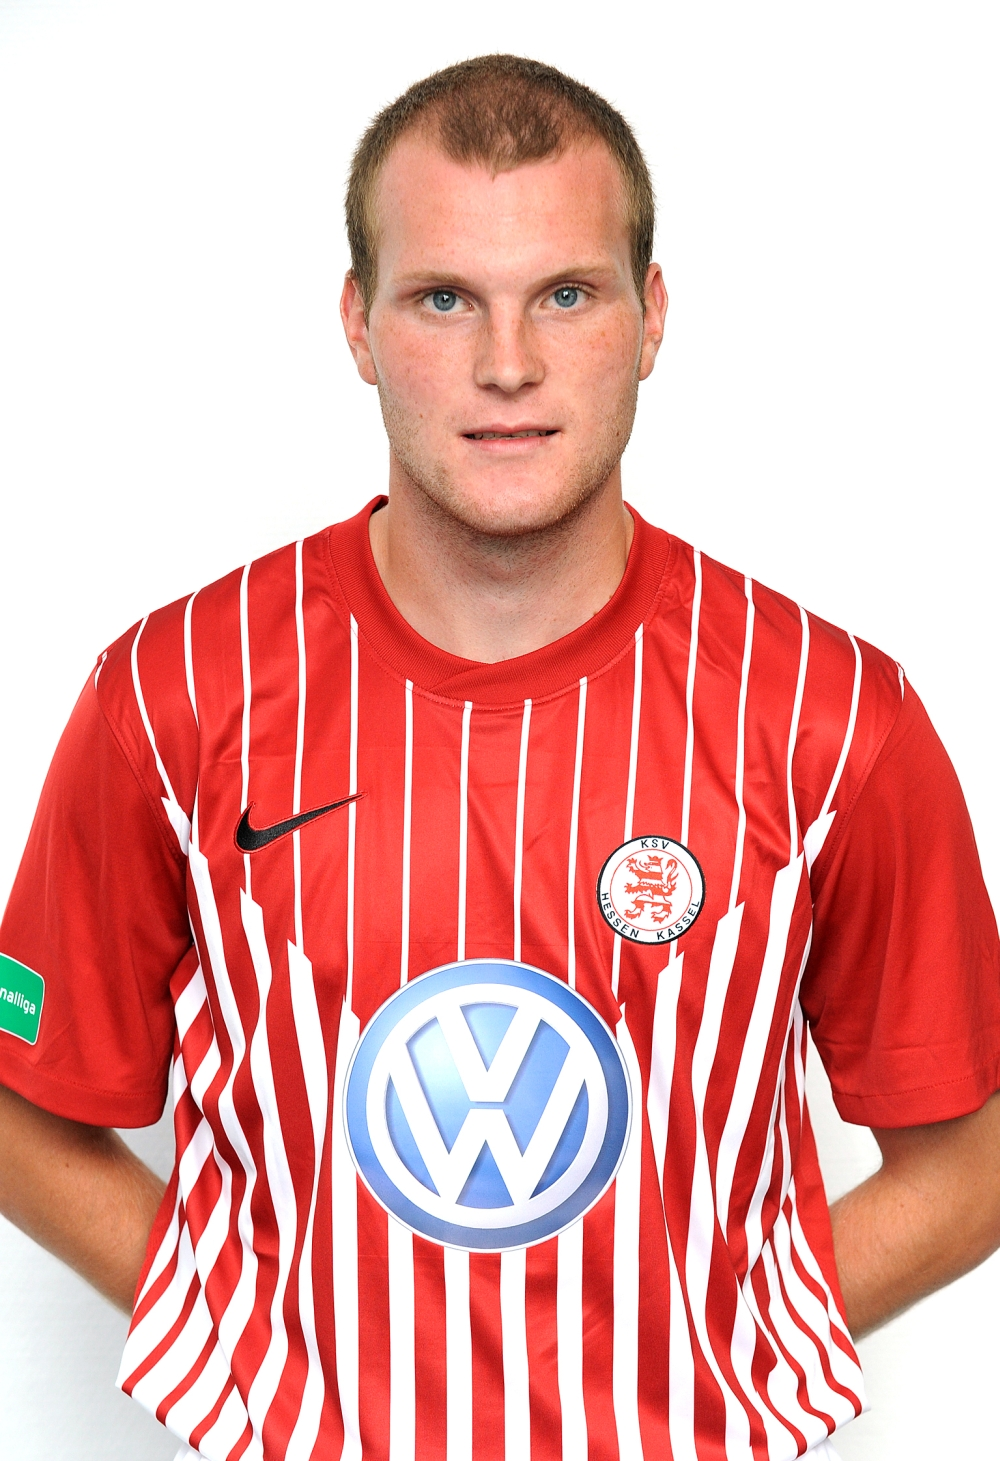 Spielerprofil 2011: Bernd Gerdes